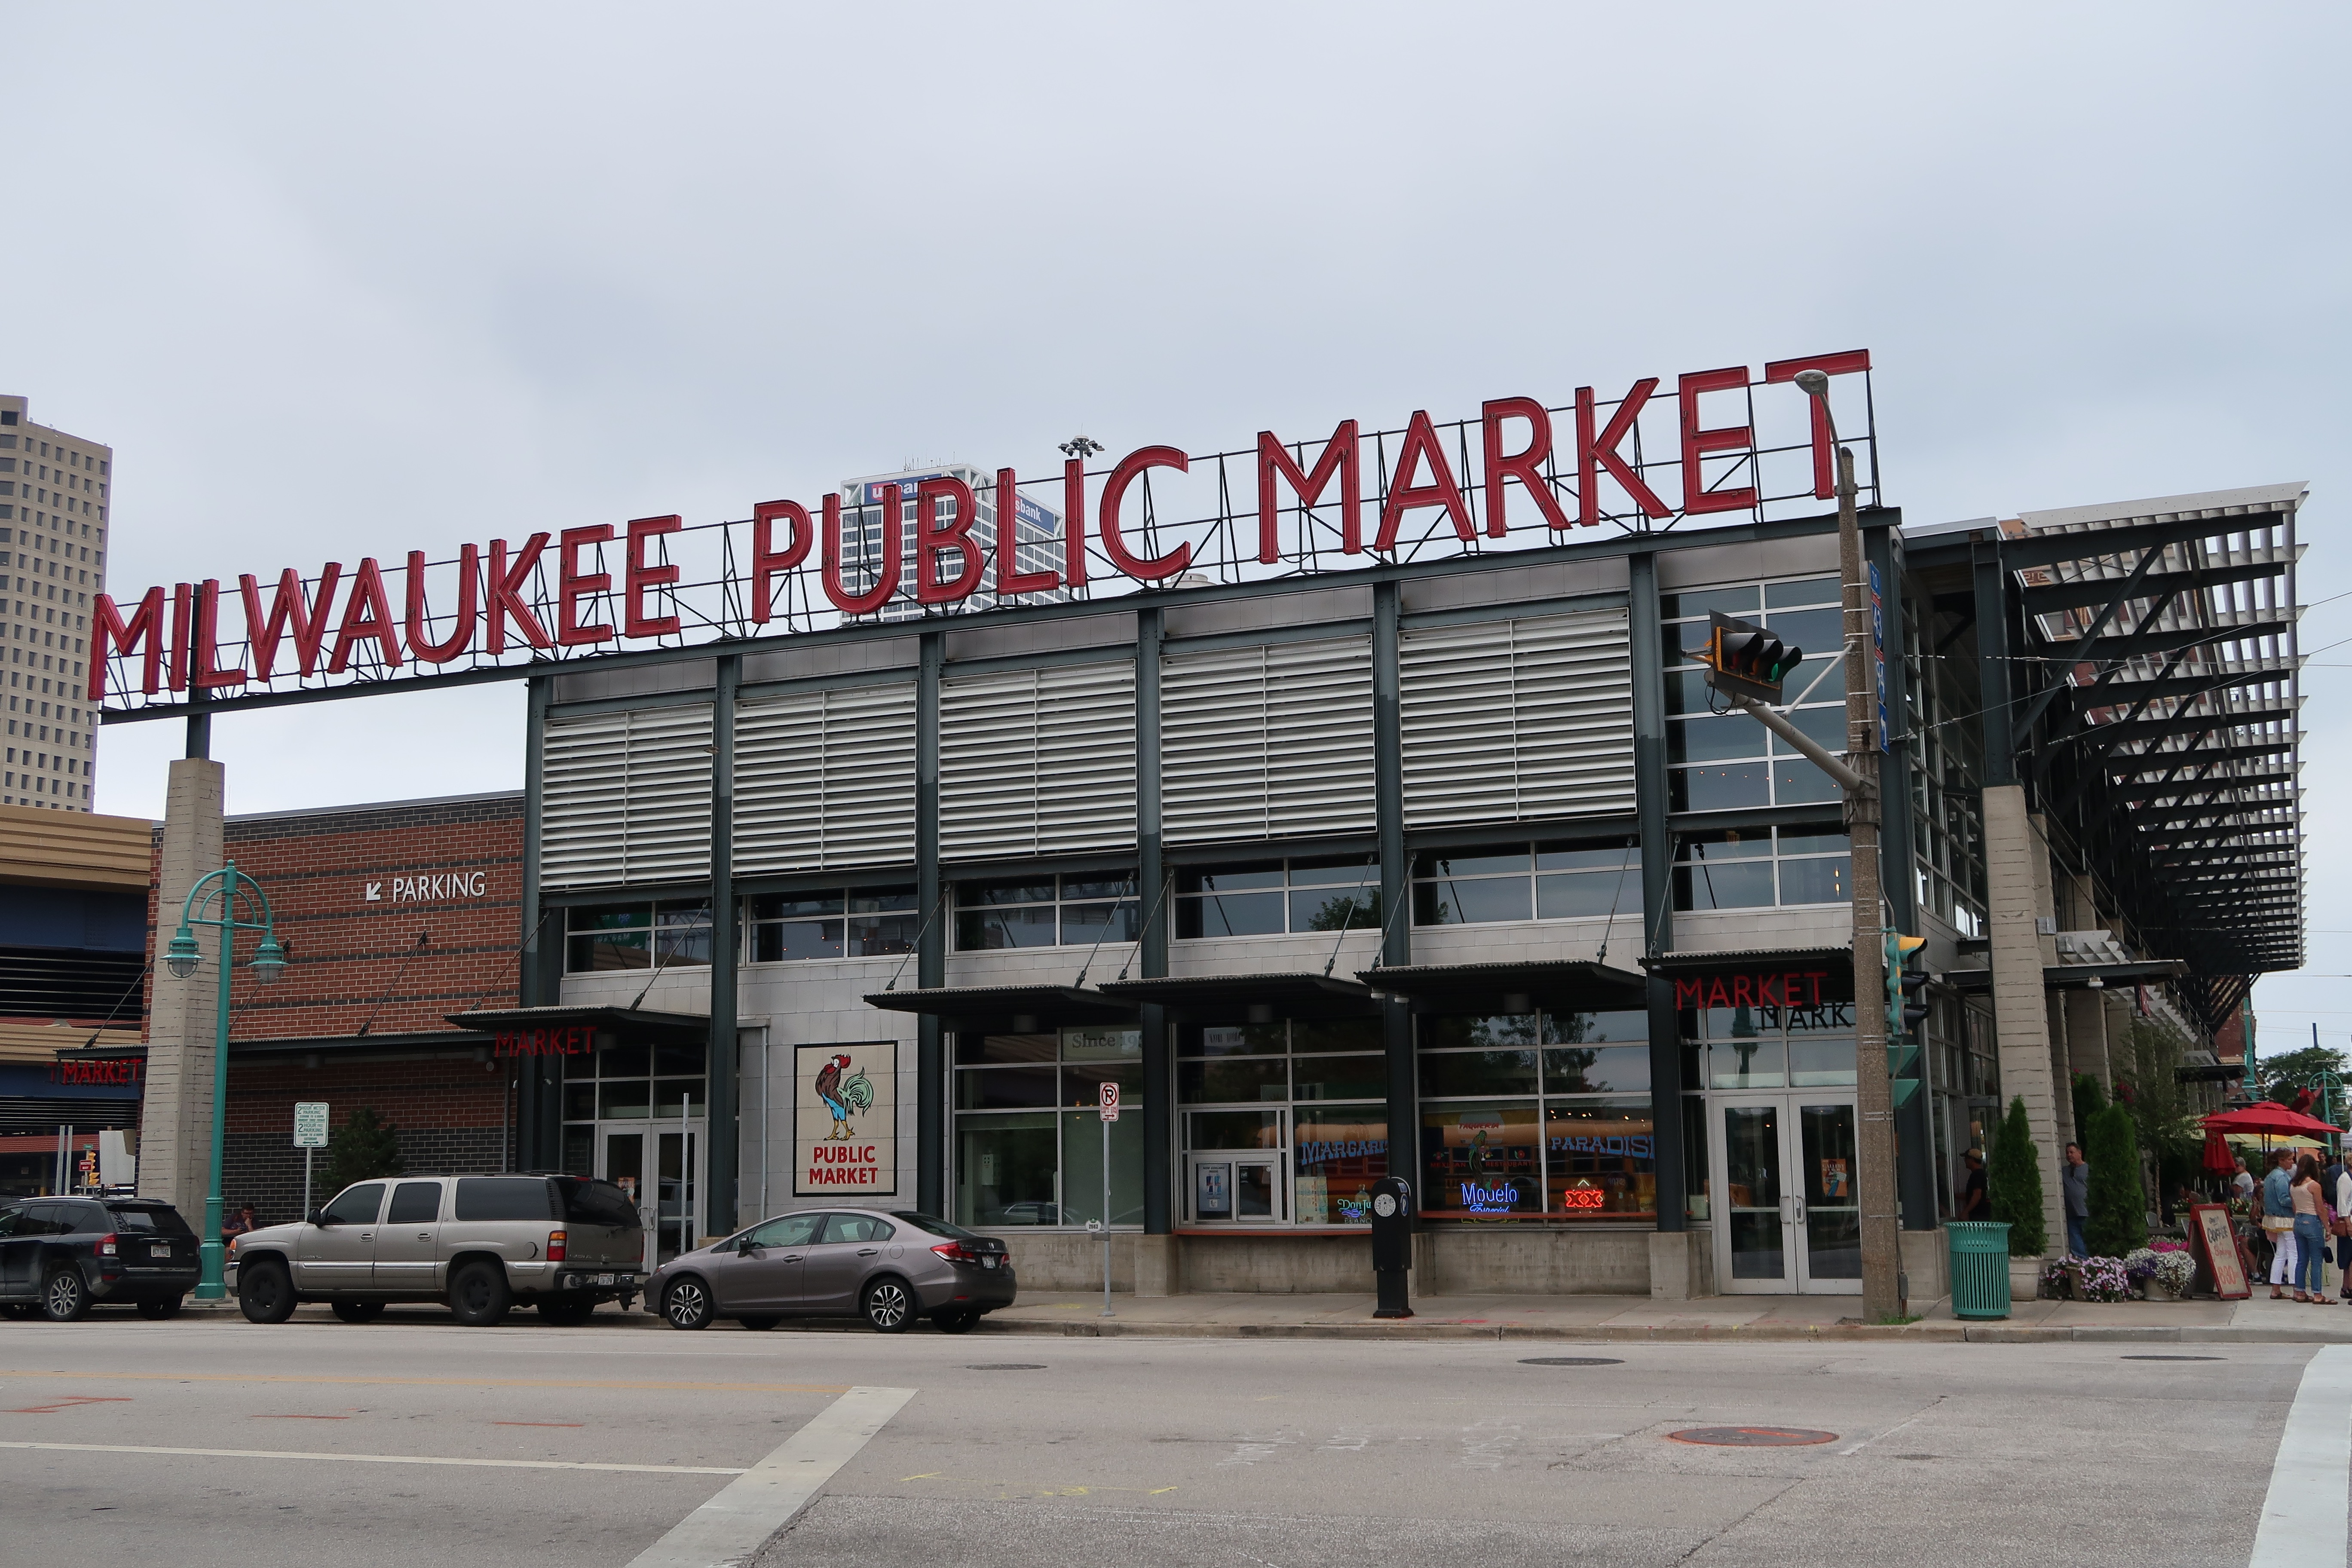 Milwaukee Wisconsin City Architecture